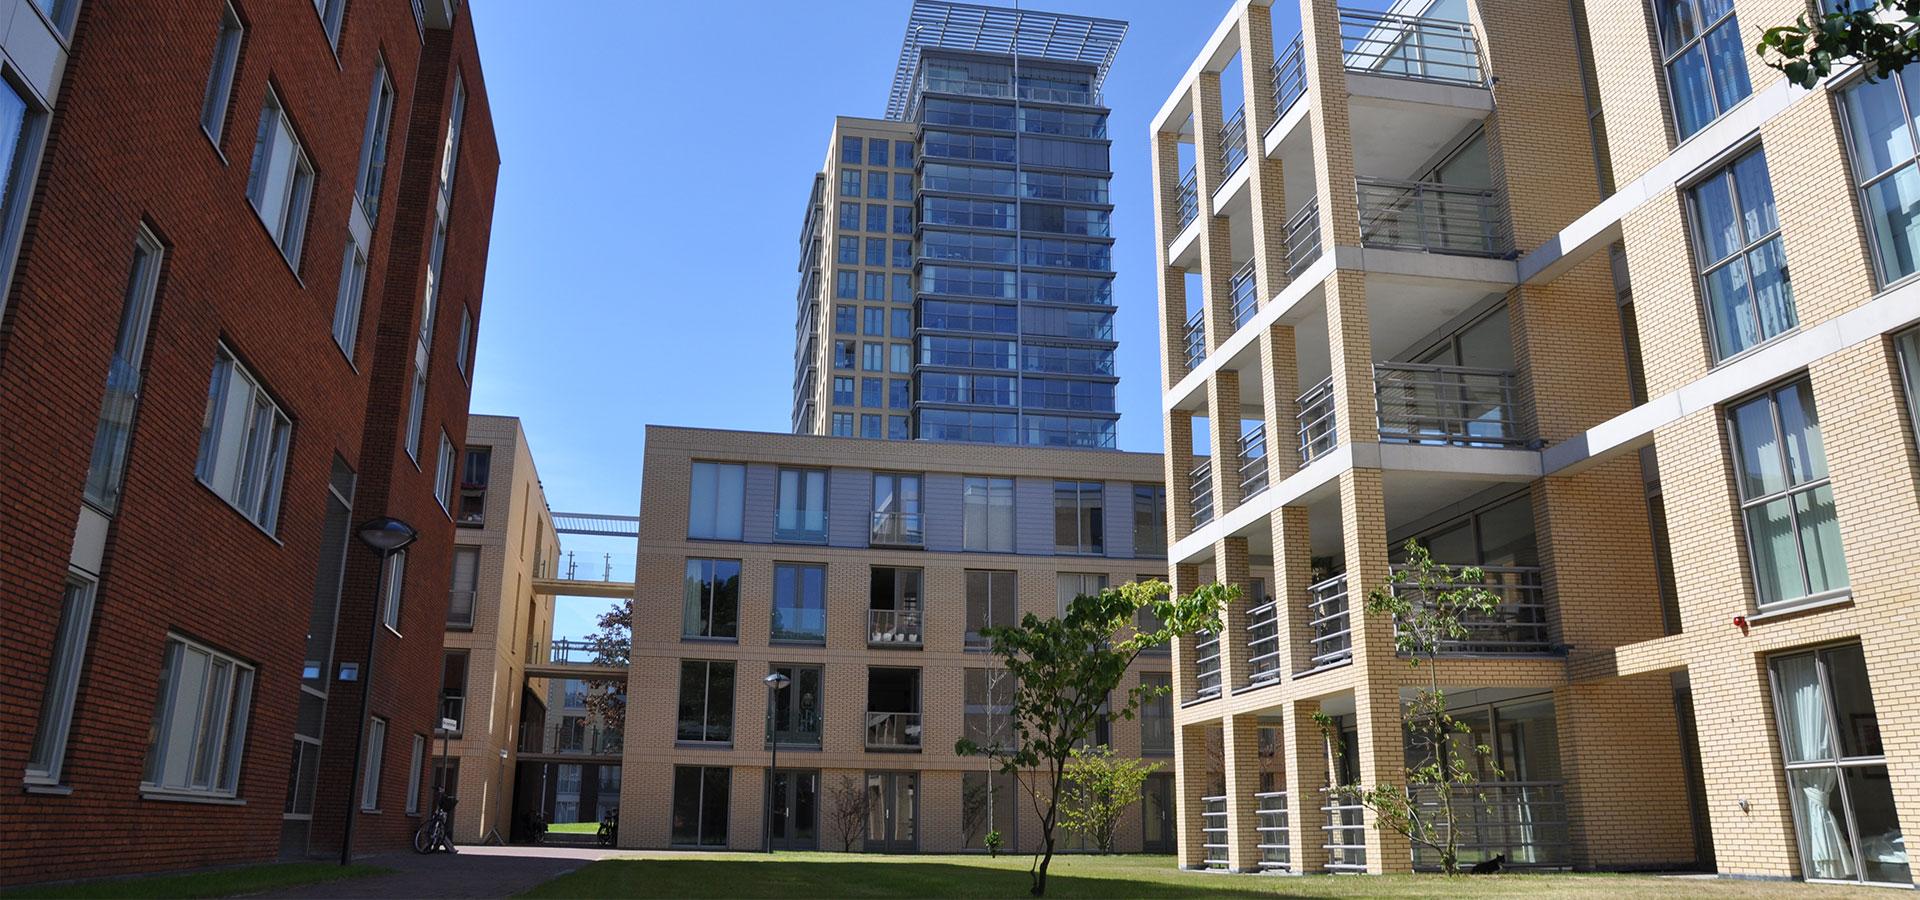 FARO architecten Mariastichting Haarlem 02